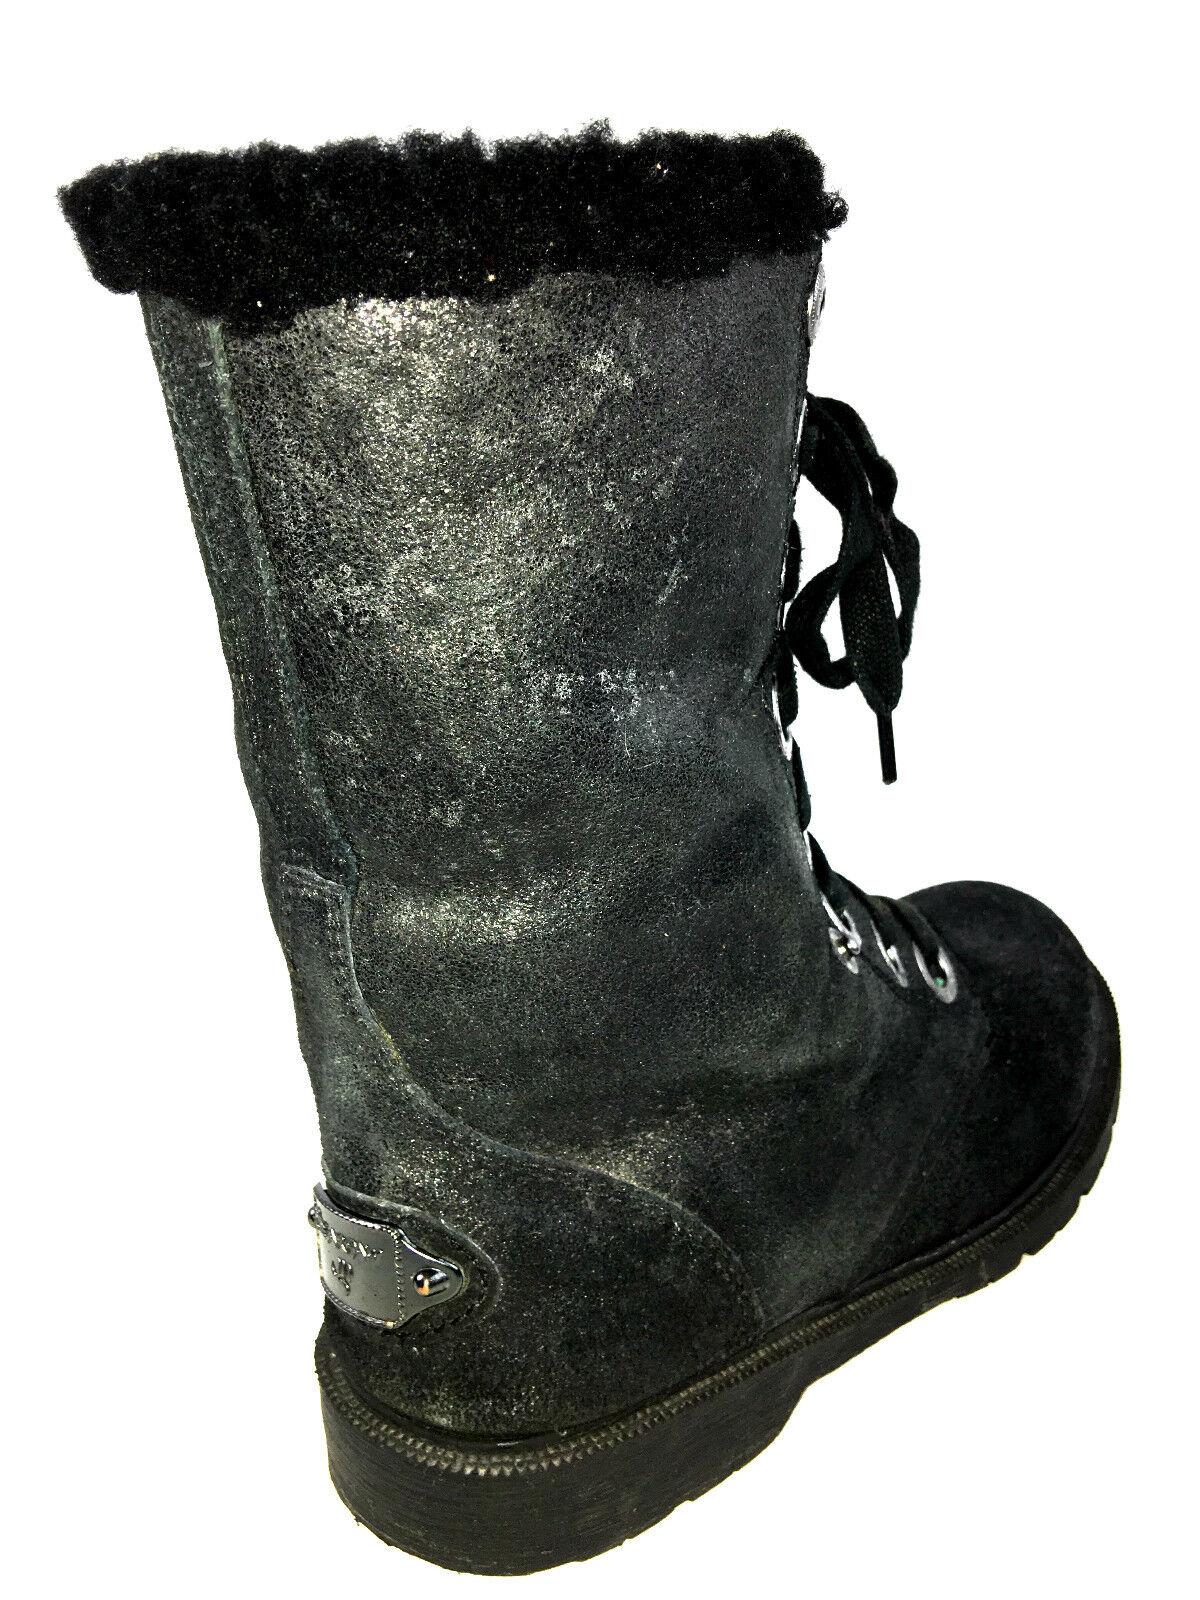 Bearpaw Women's Ankle-High Sheepskin Boot Black Size 8 Usa.